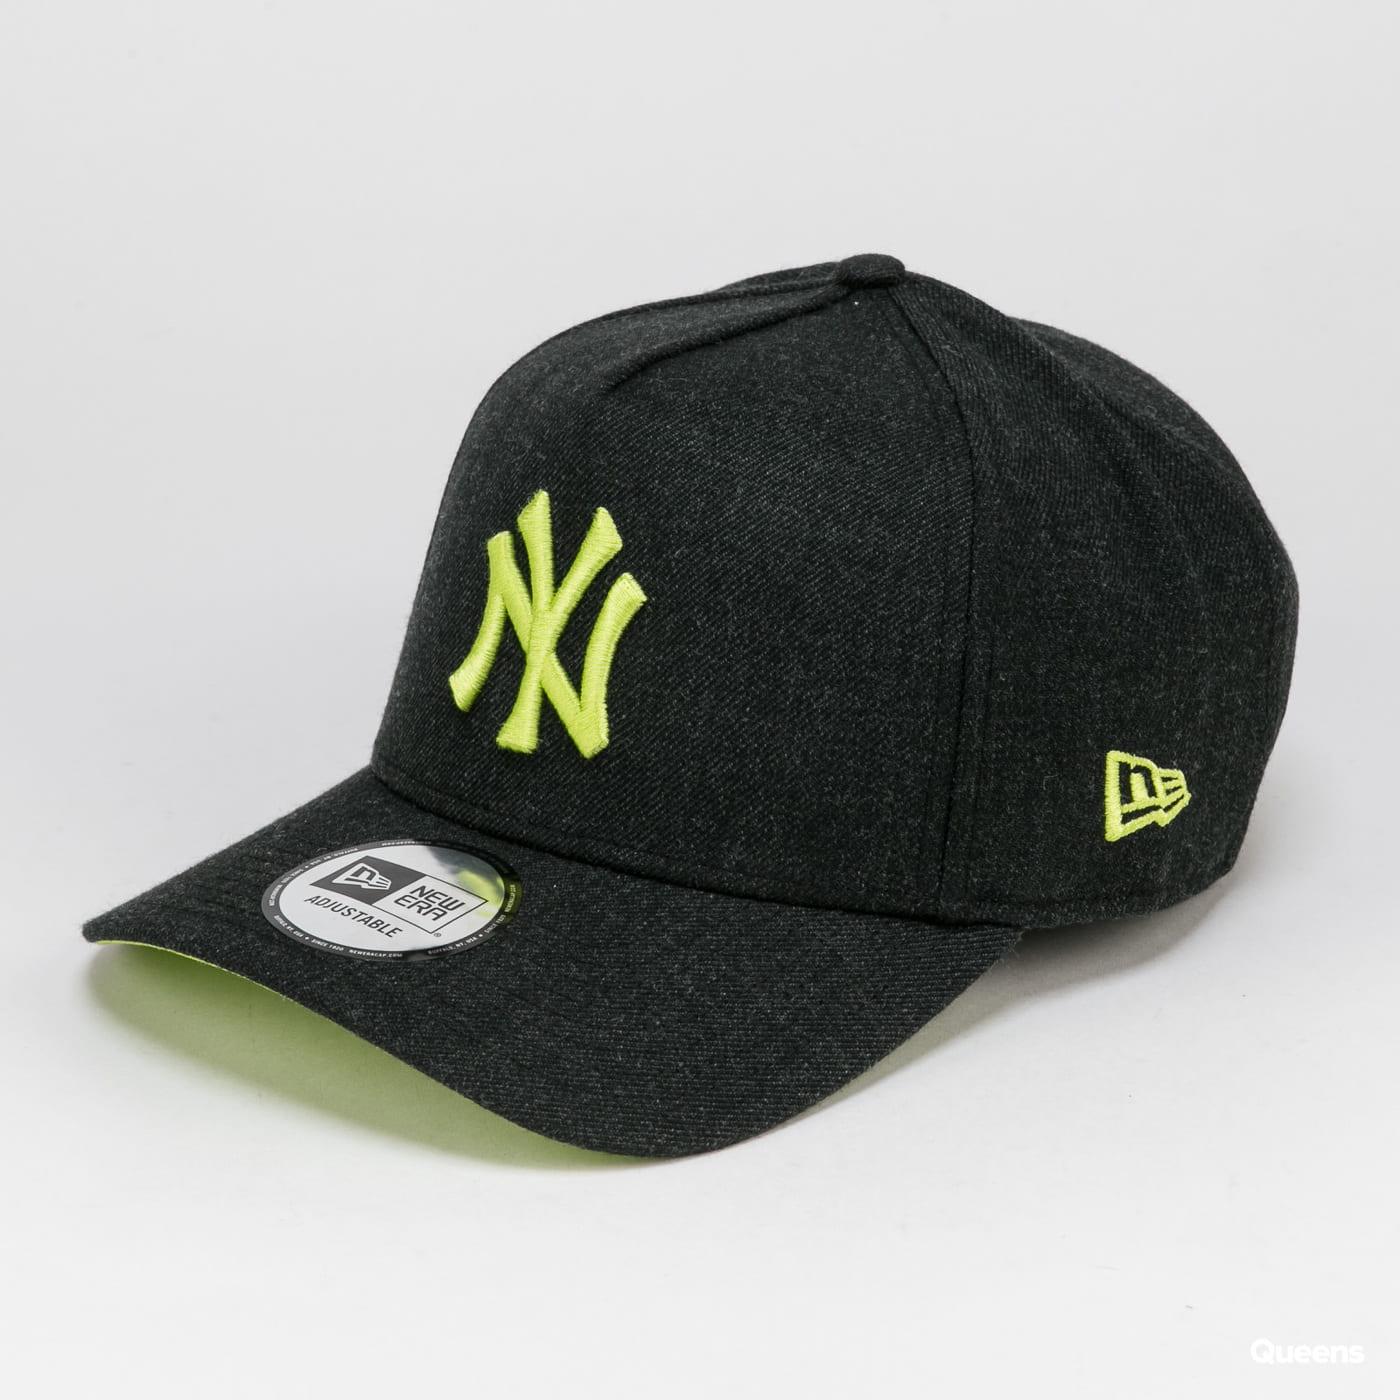 New Era 940 MLB Heather Pop Aframe NY melange black / yellow-green